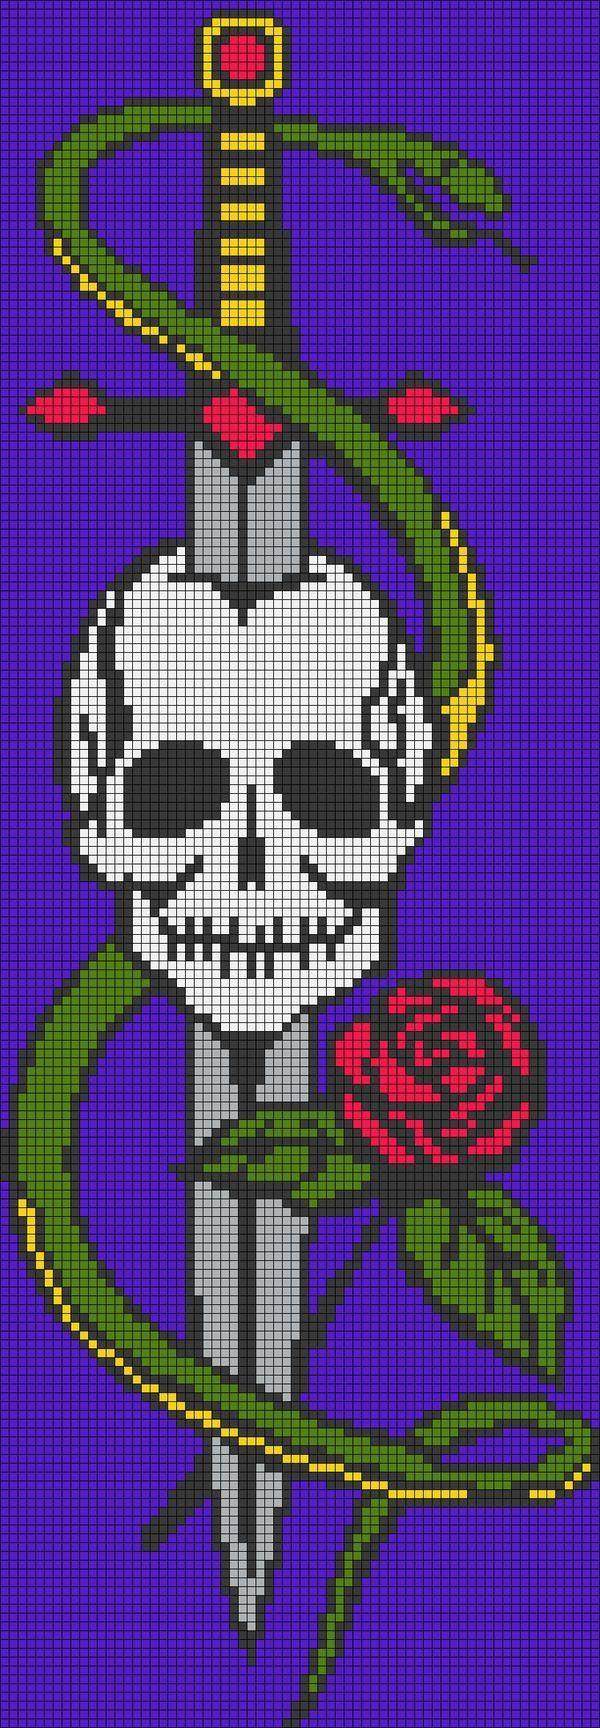 Pixel Art Grid Large Pixel Art Grid Gallery